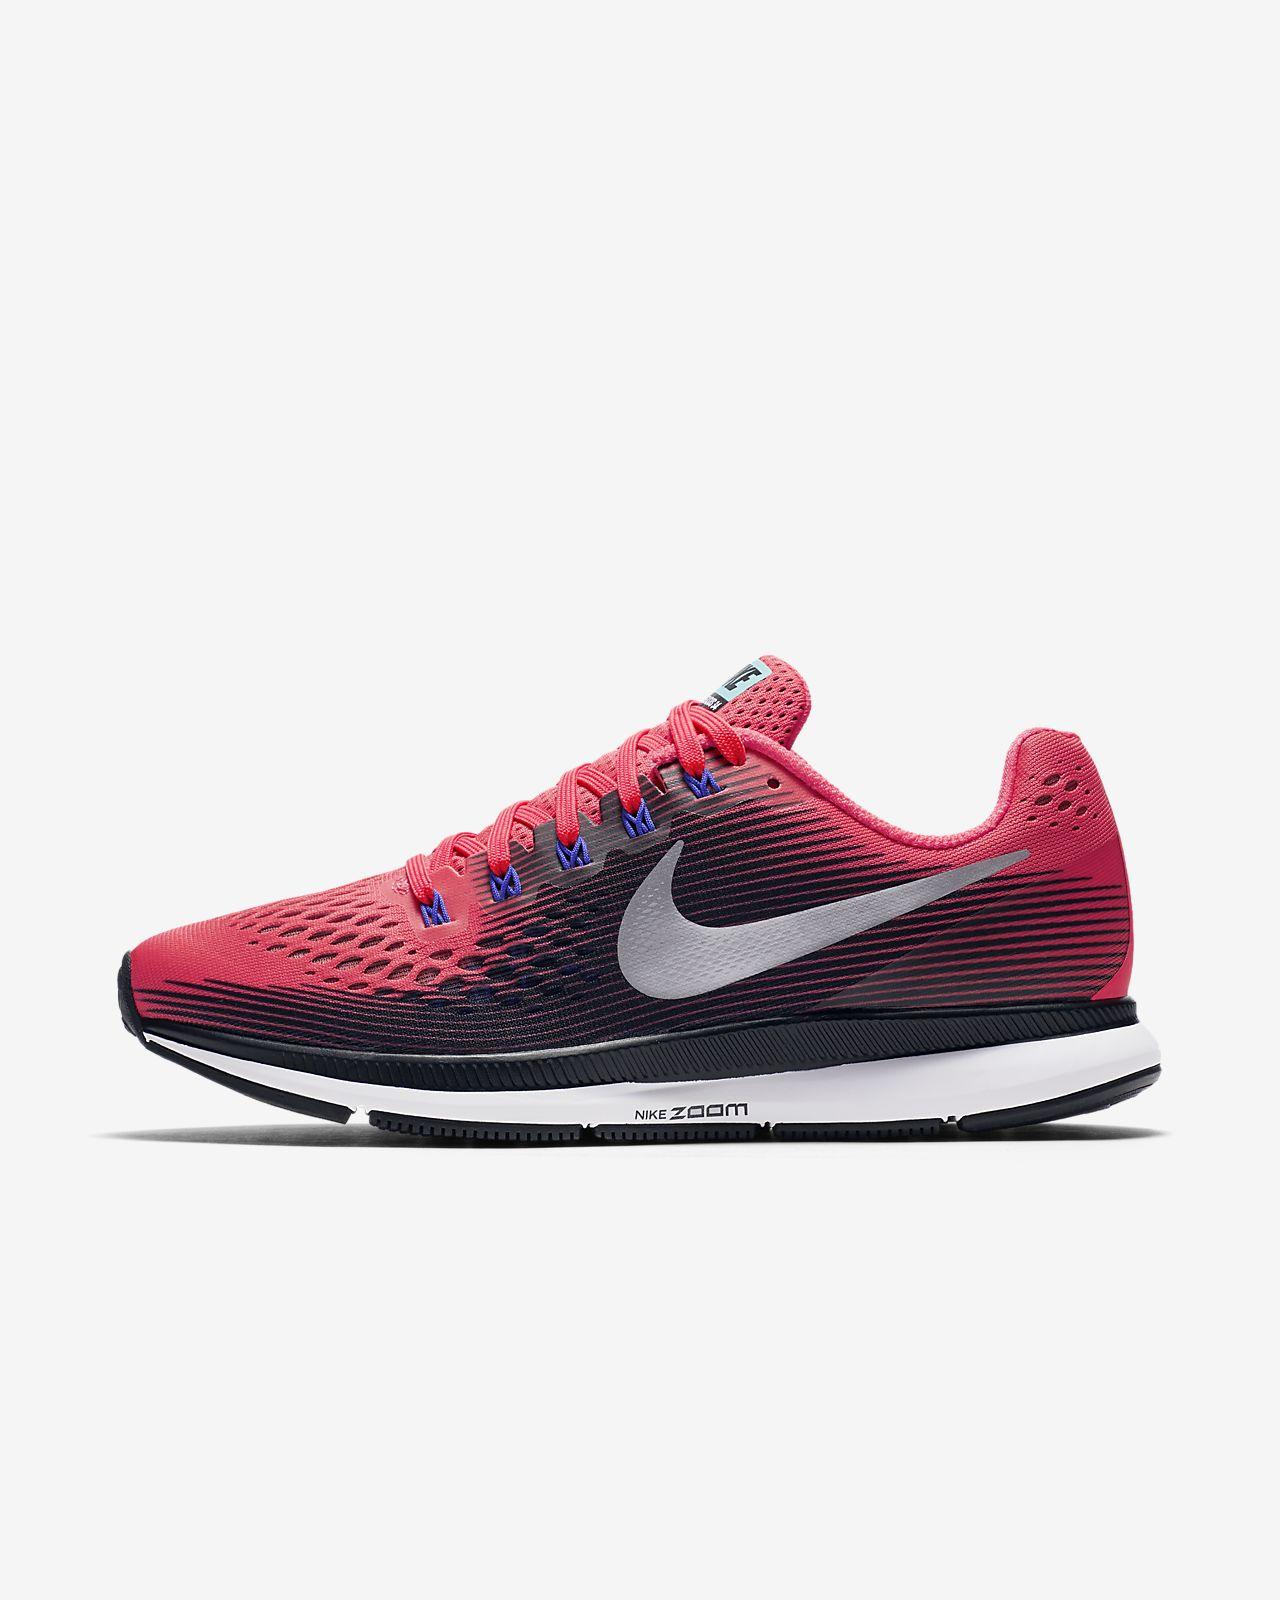 171ca4b7a2573 discount code for nike air zoom pegasus 34 womens running shoe 14a3e 407f9